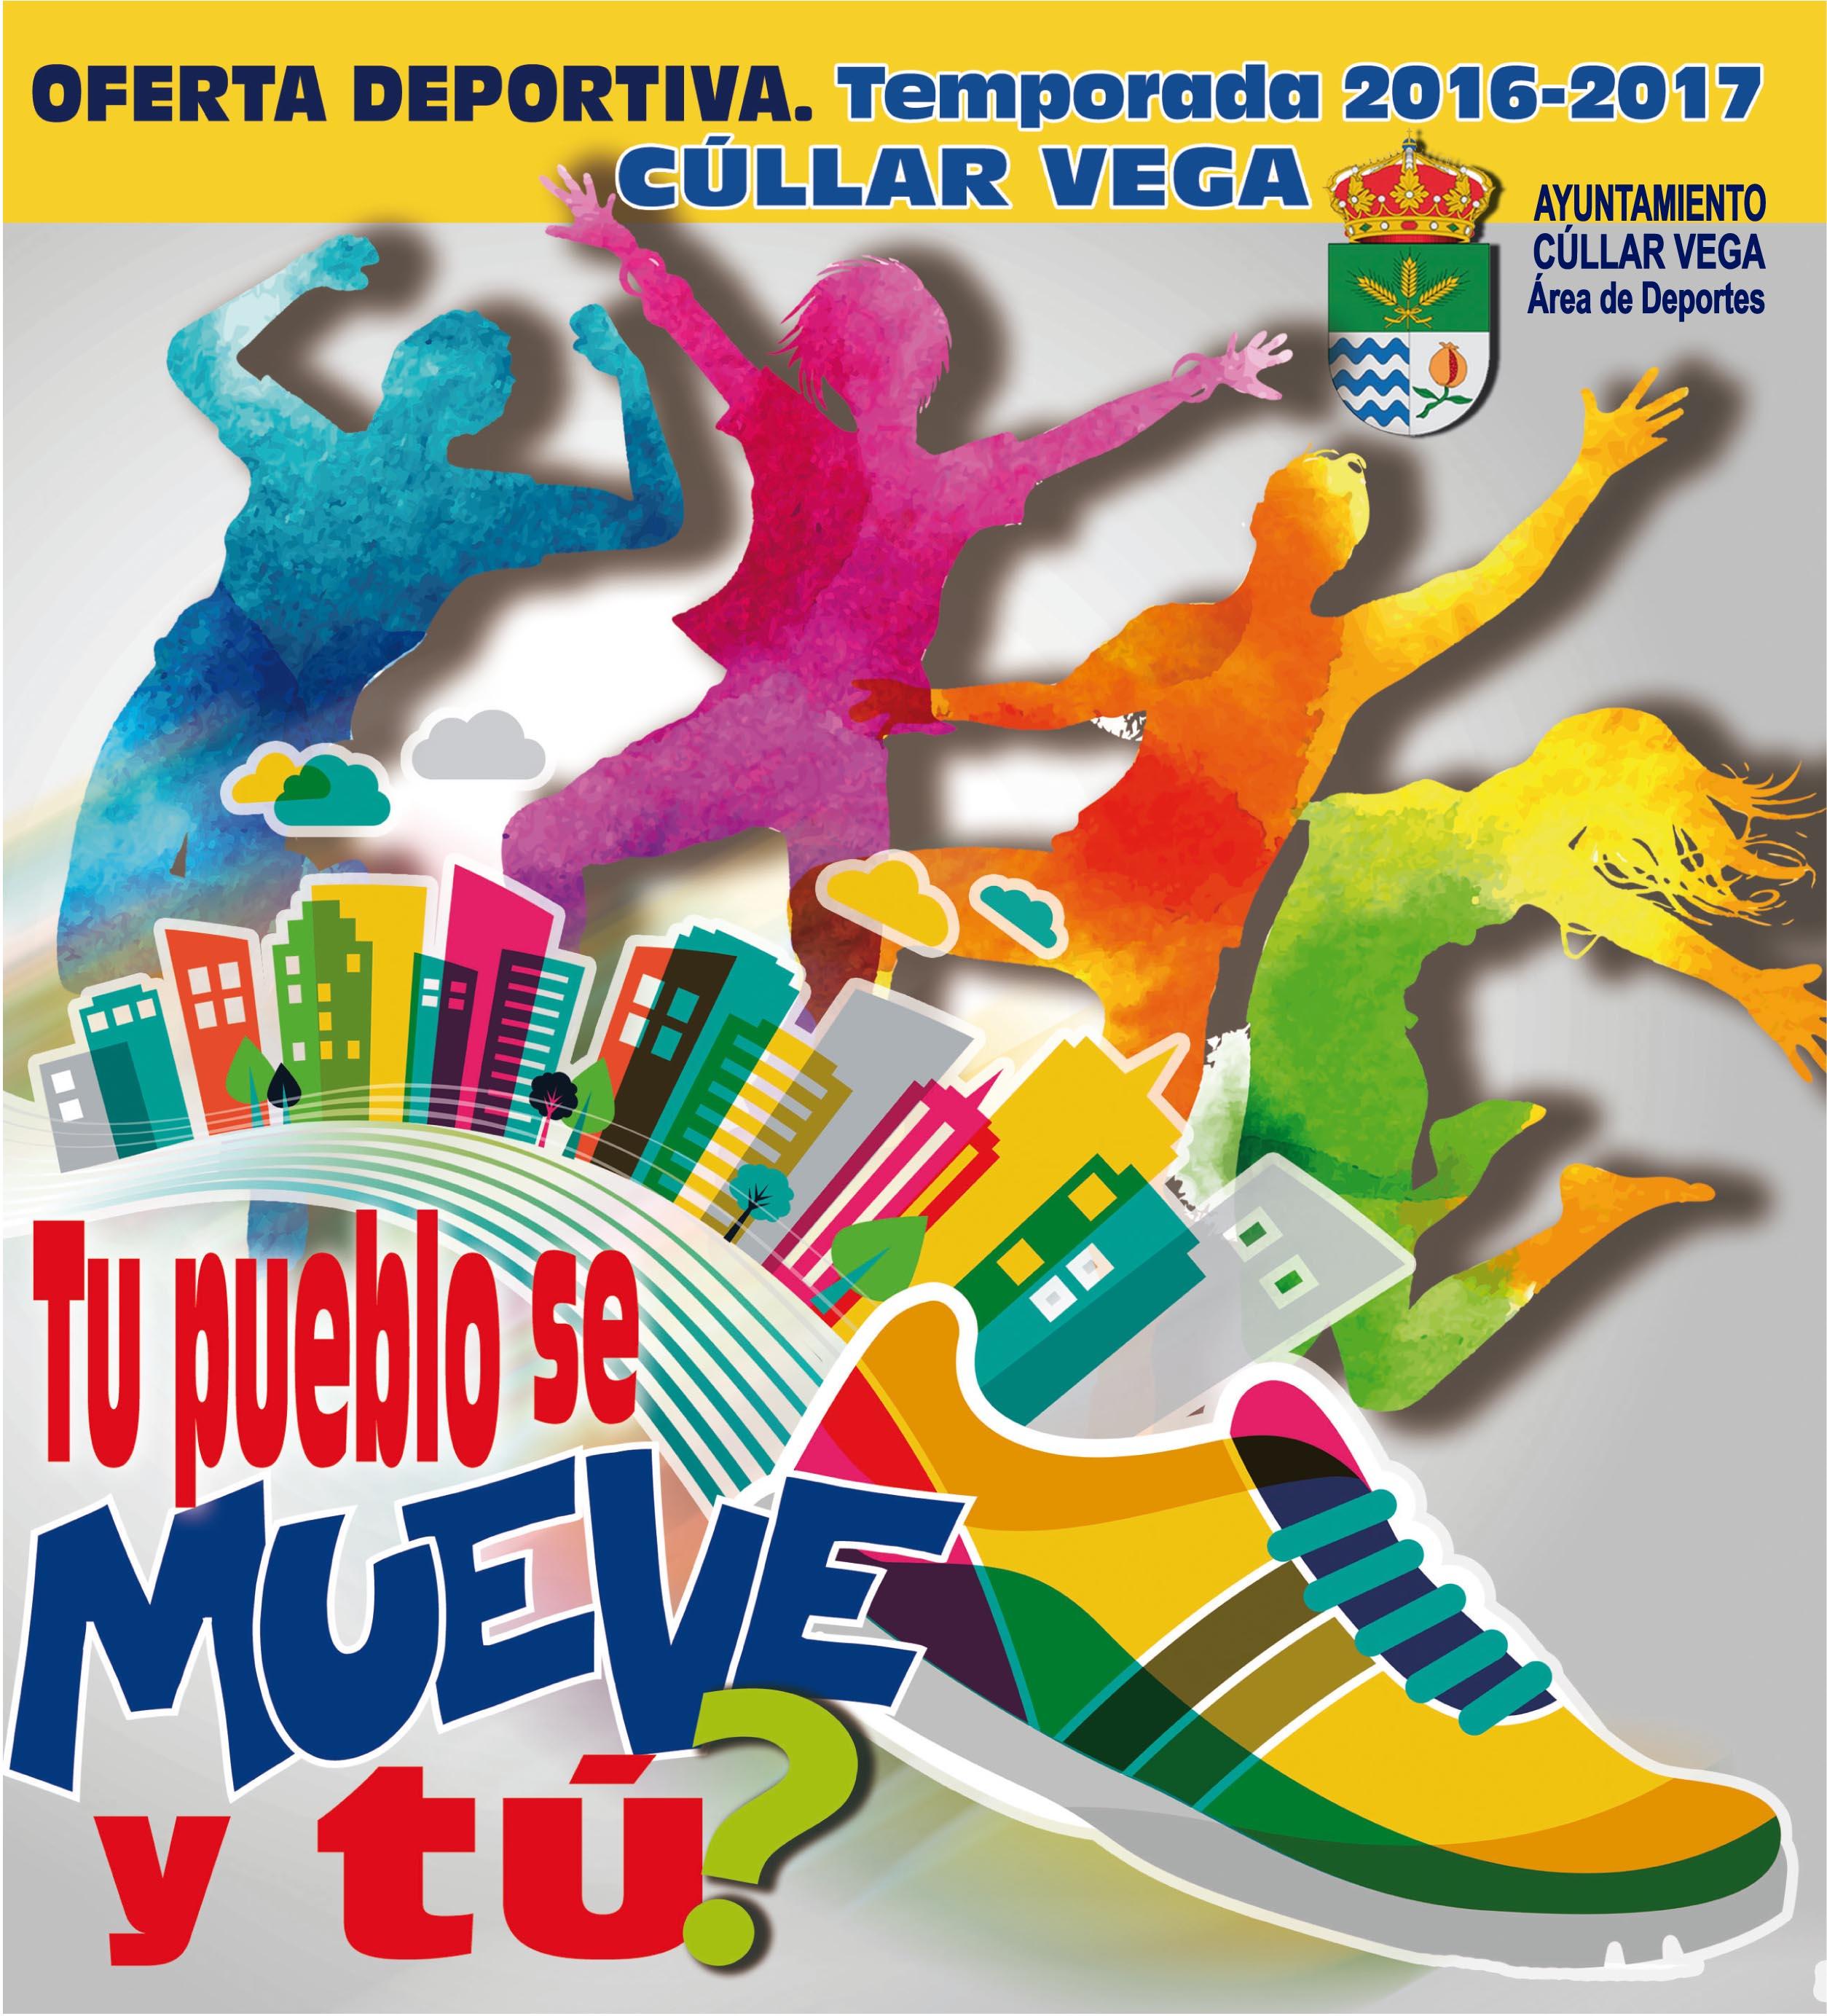 Oferta Deportiva Cúllar Vega Temporada 2016/2017